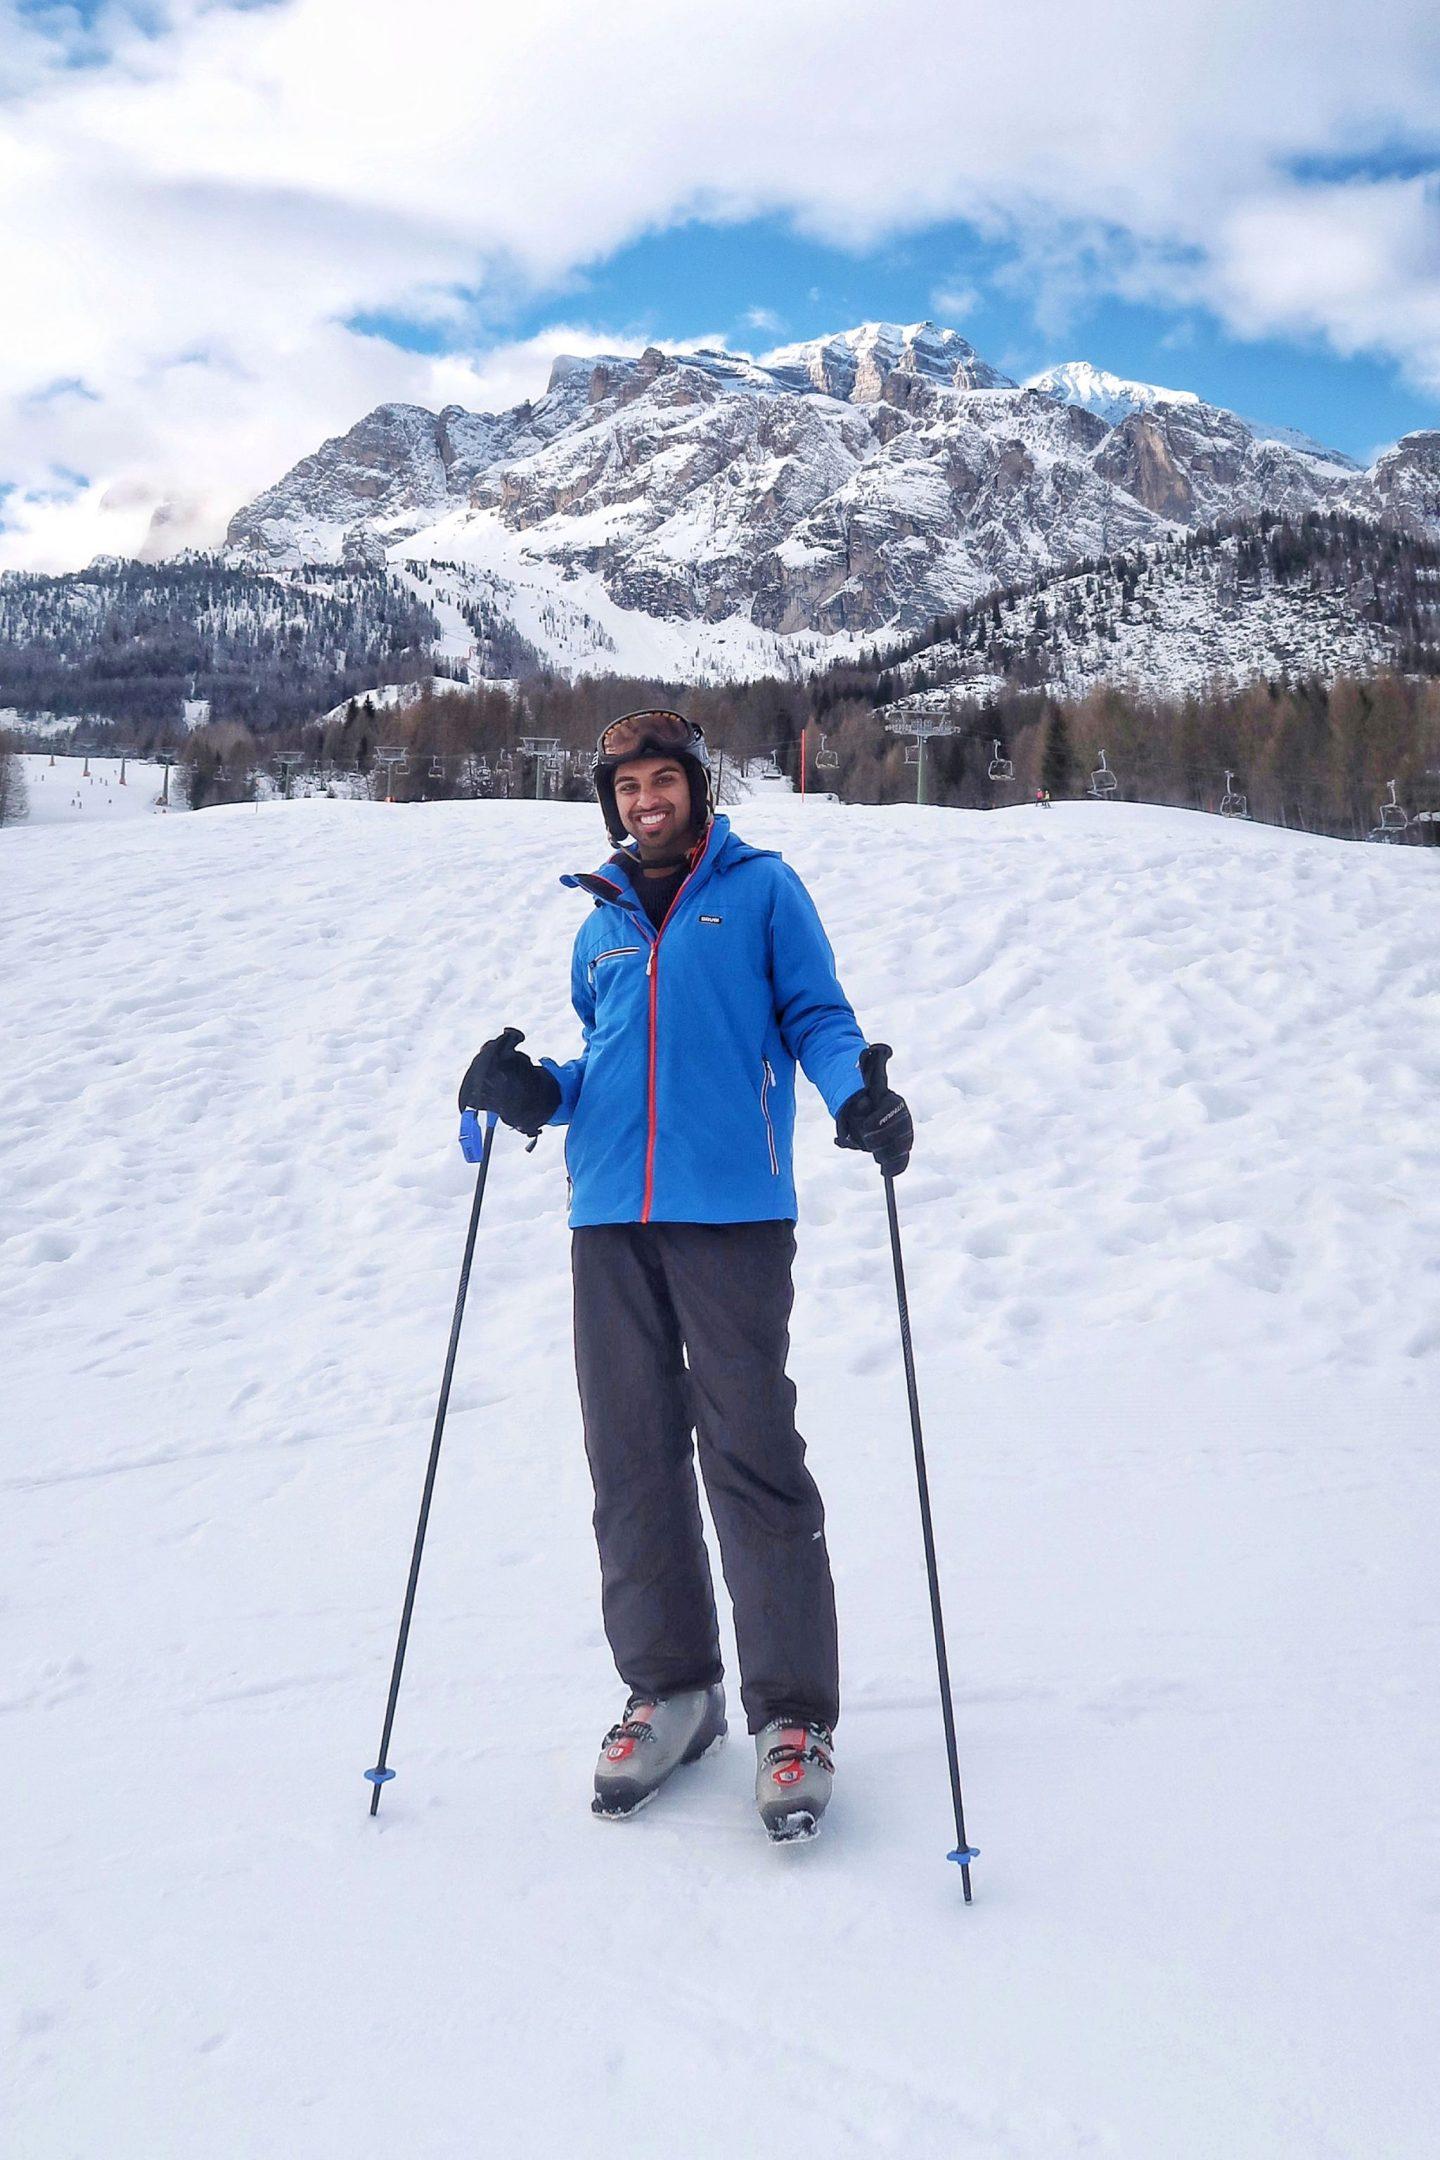 Travel: The Dolomites